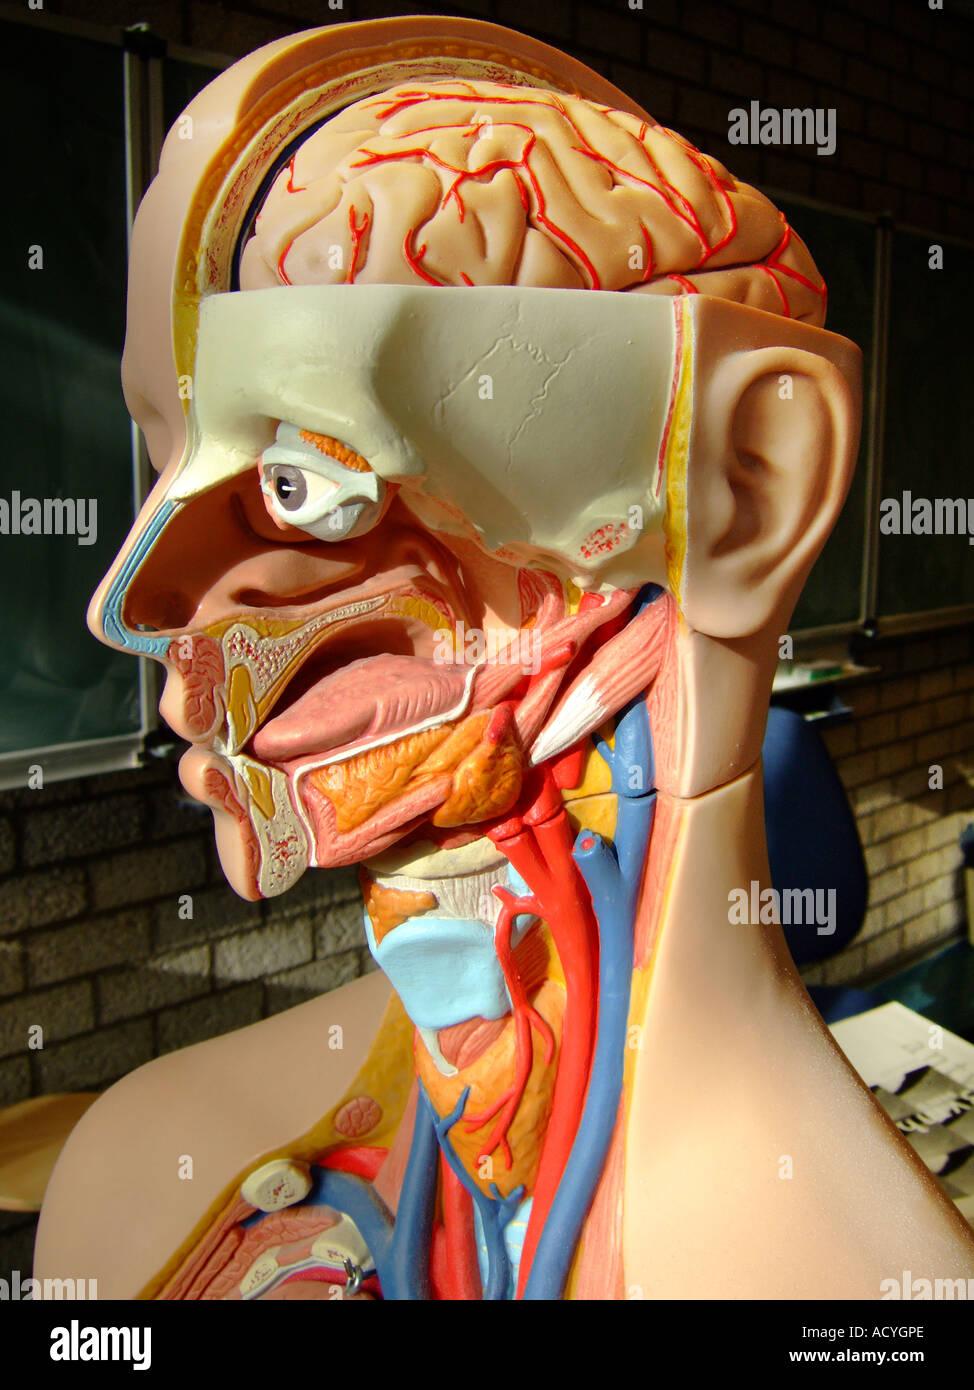 Laryngopharynx Stock Photos & Laryngopharynx Stock Images - Alamy